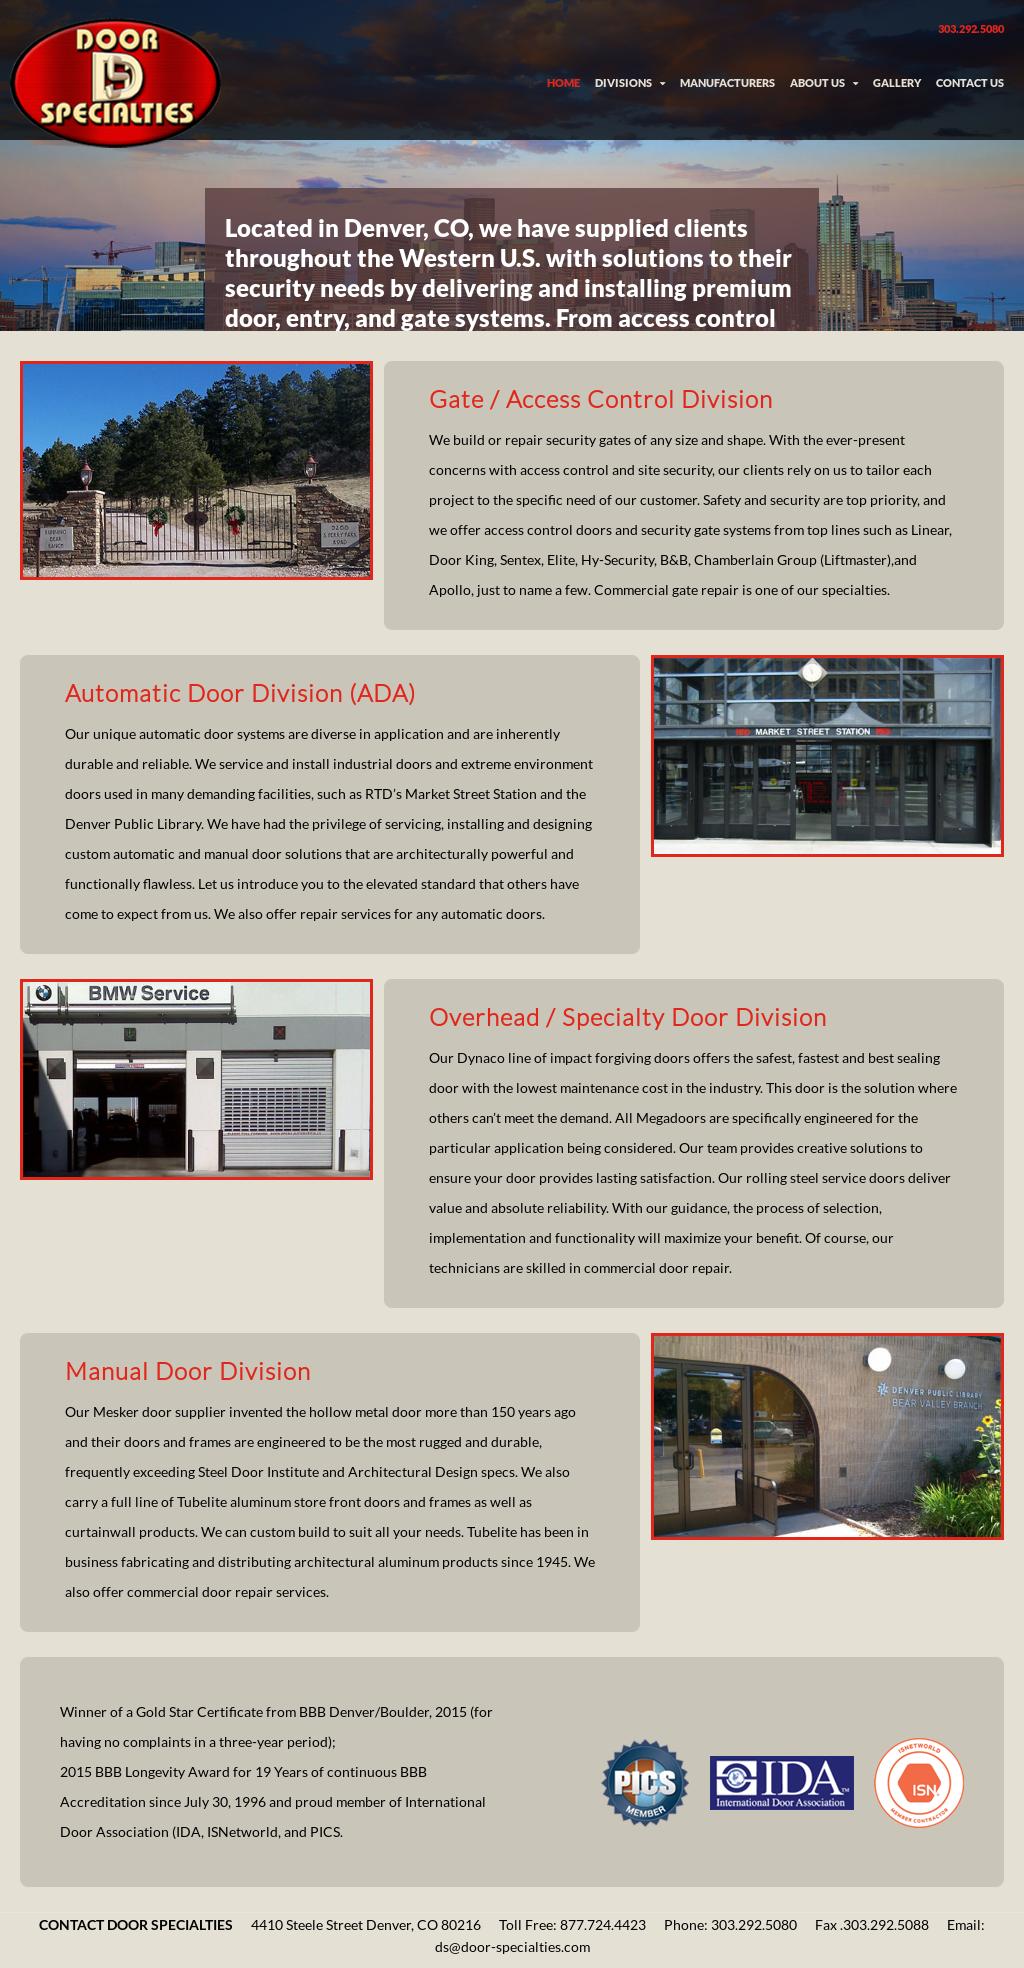 Door Specialties Competitors, Revenue And Employees   Owler Company Profile